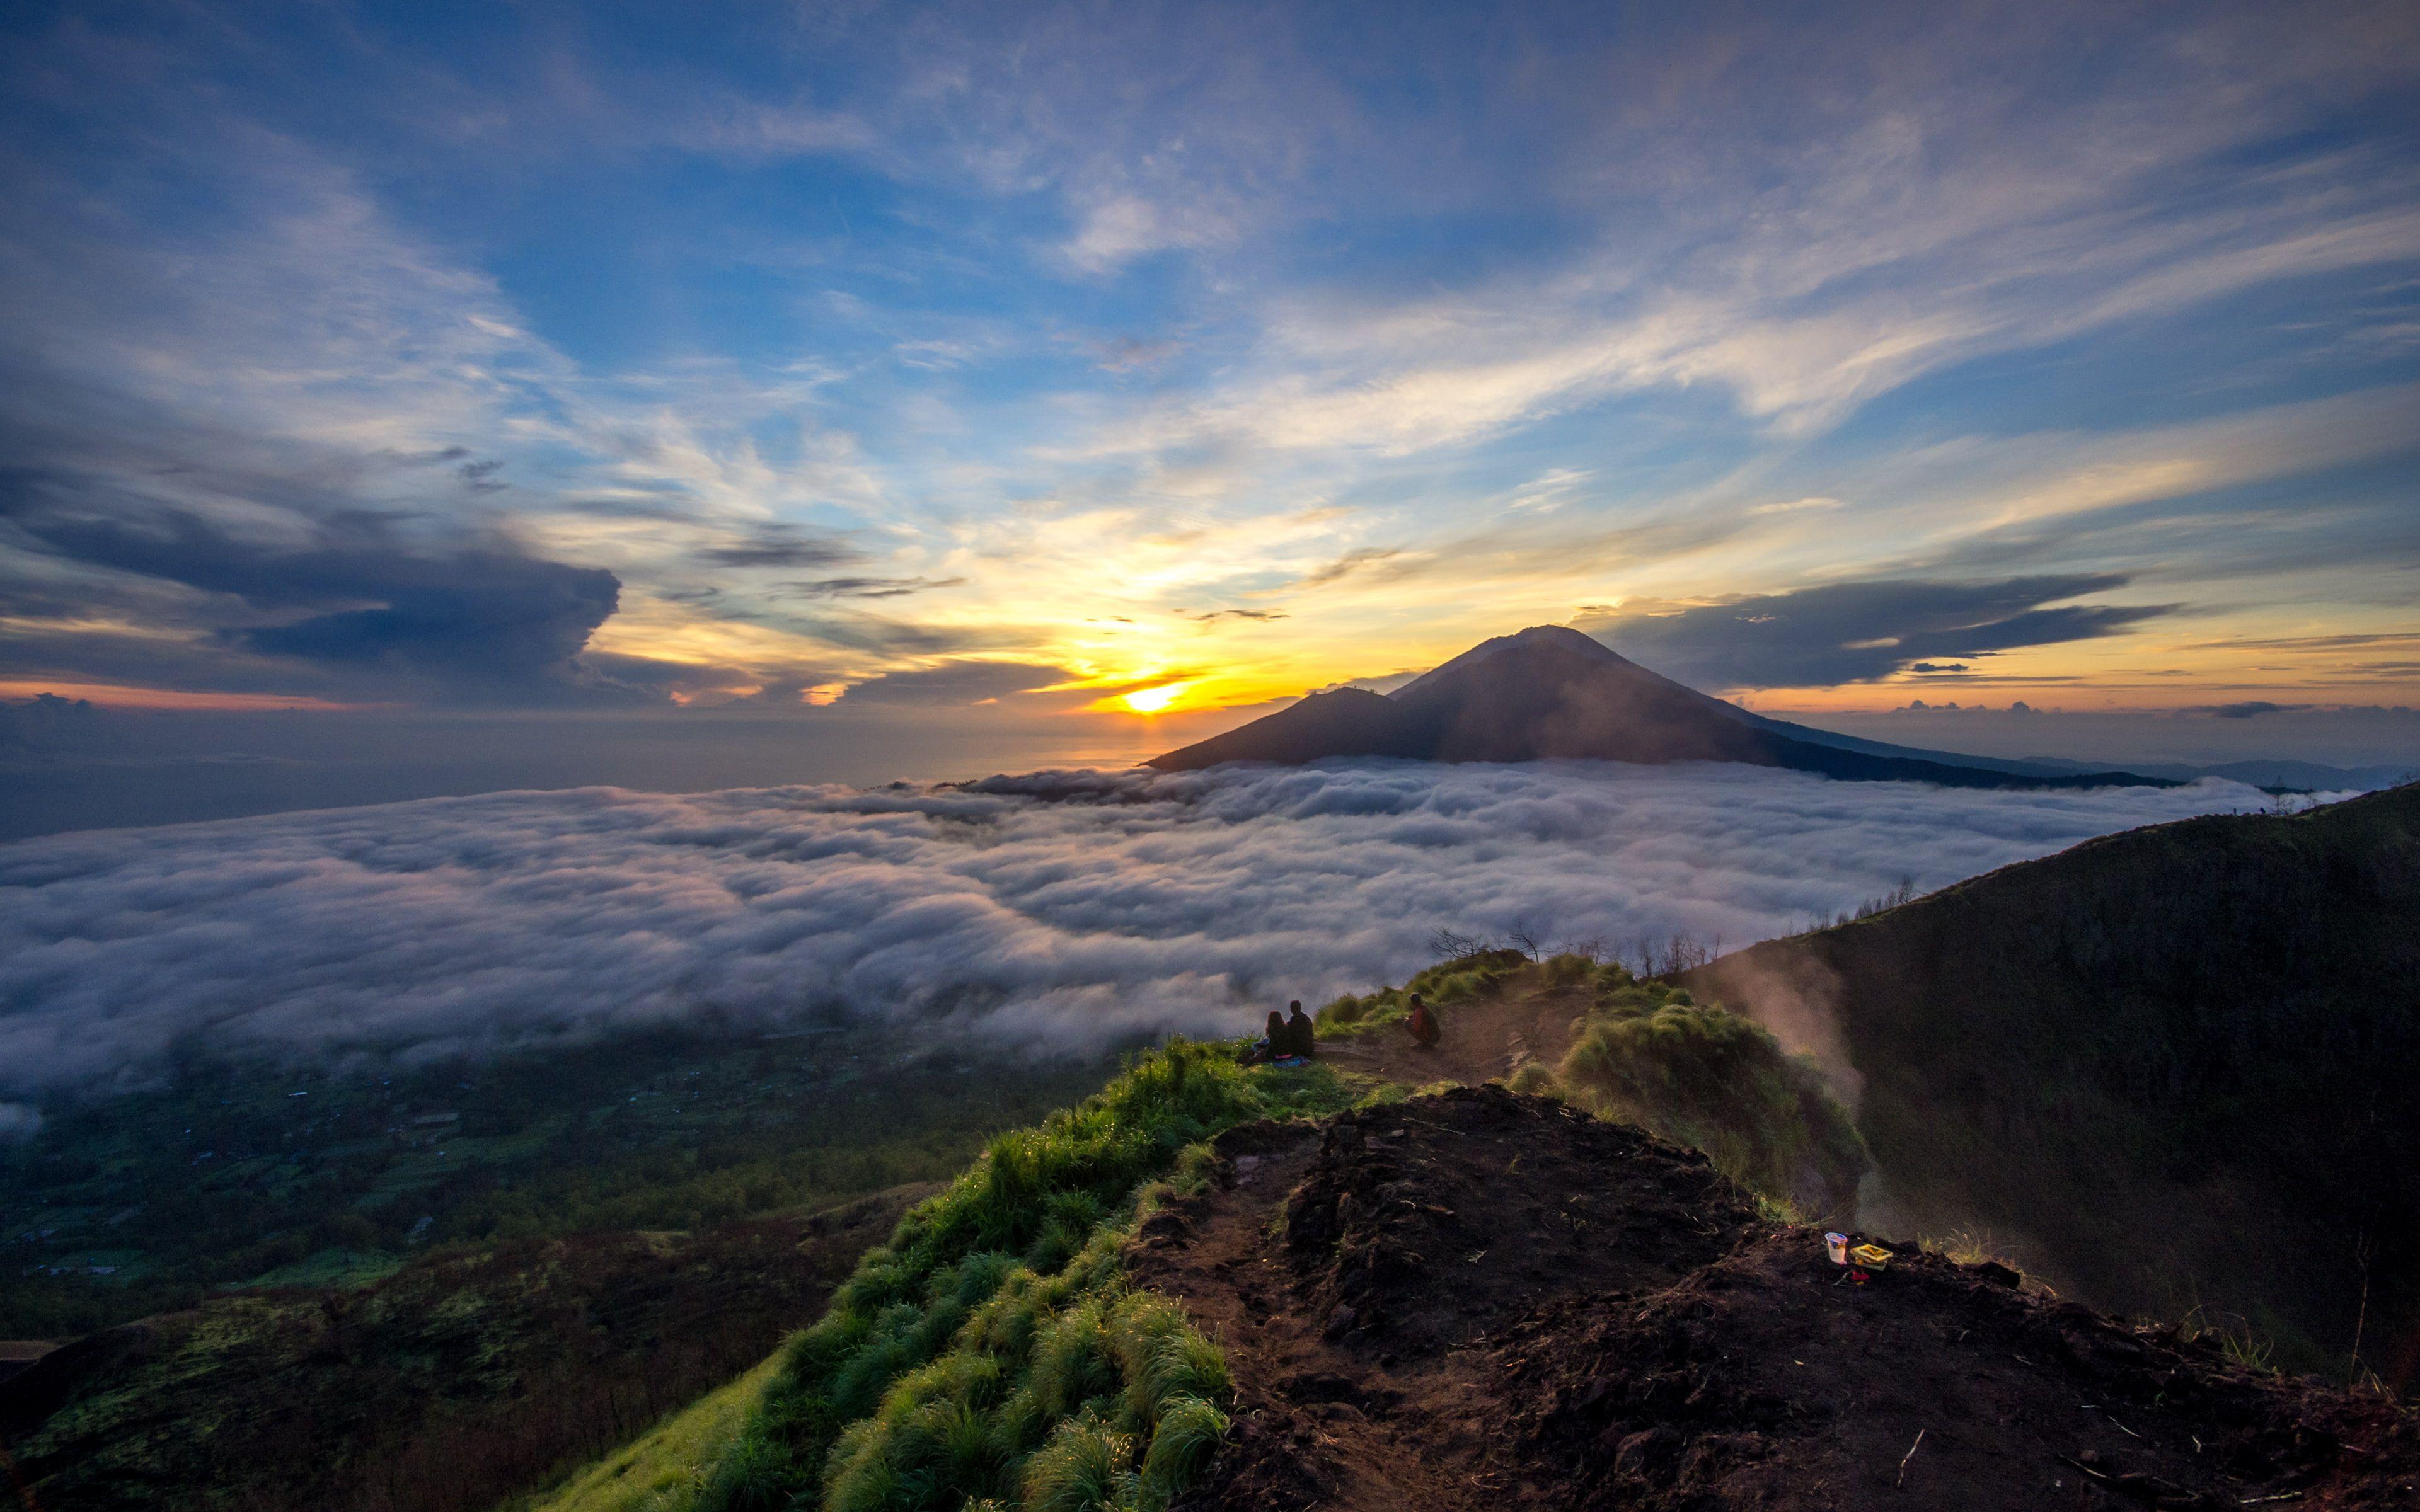 Morning Sun On Gunung Batur #gunungbatur #indonesia #mountains #nature #photography #sky #sunrise #volcanoes #4K #wallpaper #hdwallpaper #desktop